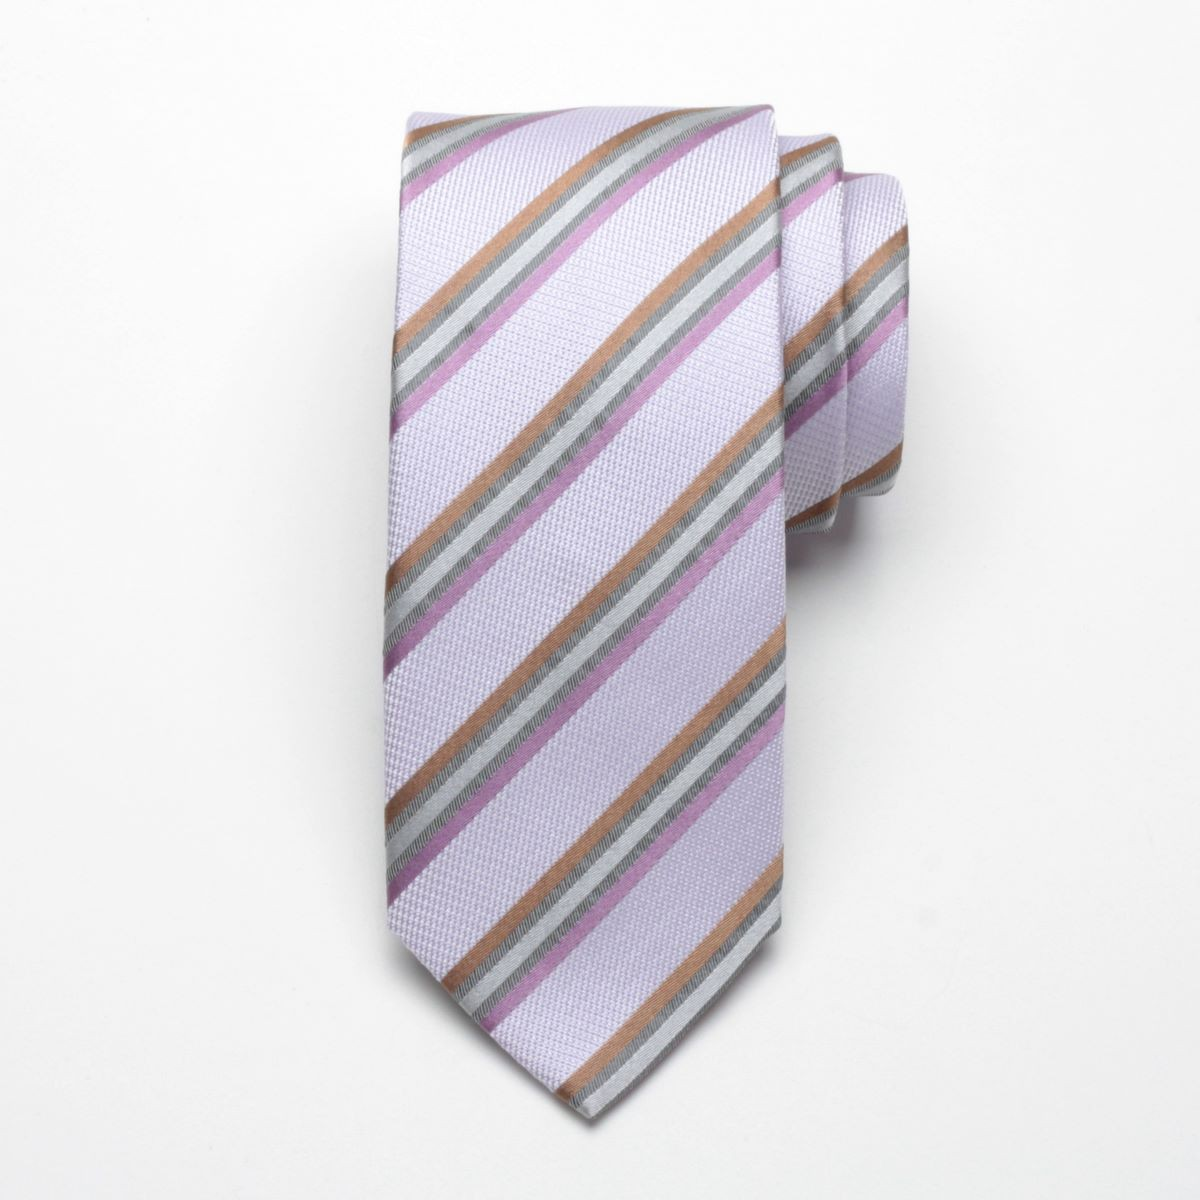 Krawat jedwabny Fine Selection (wzór 61)